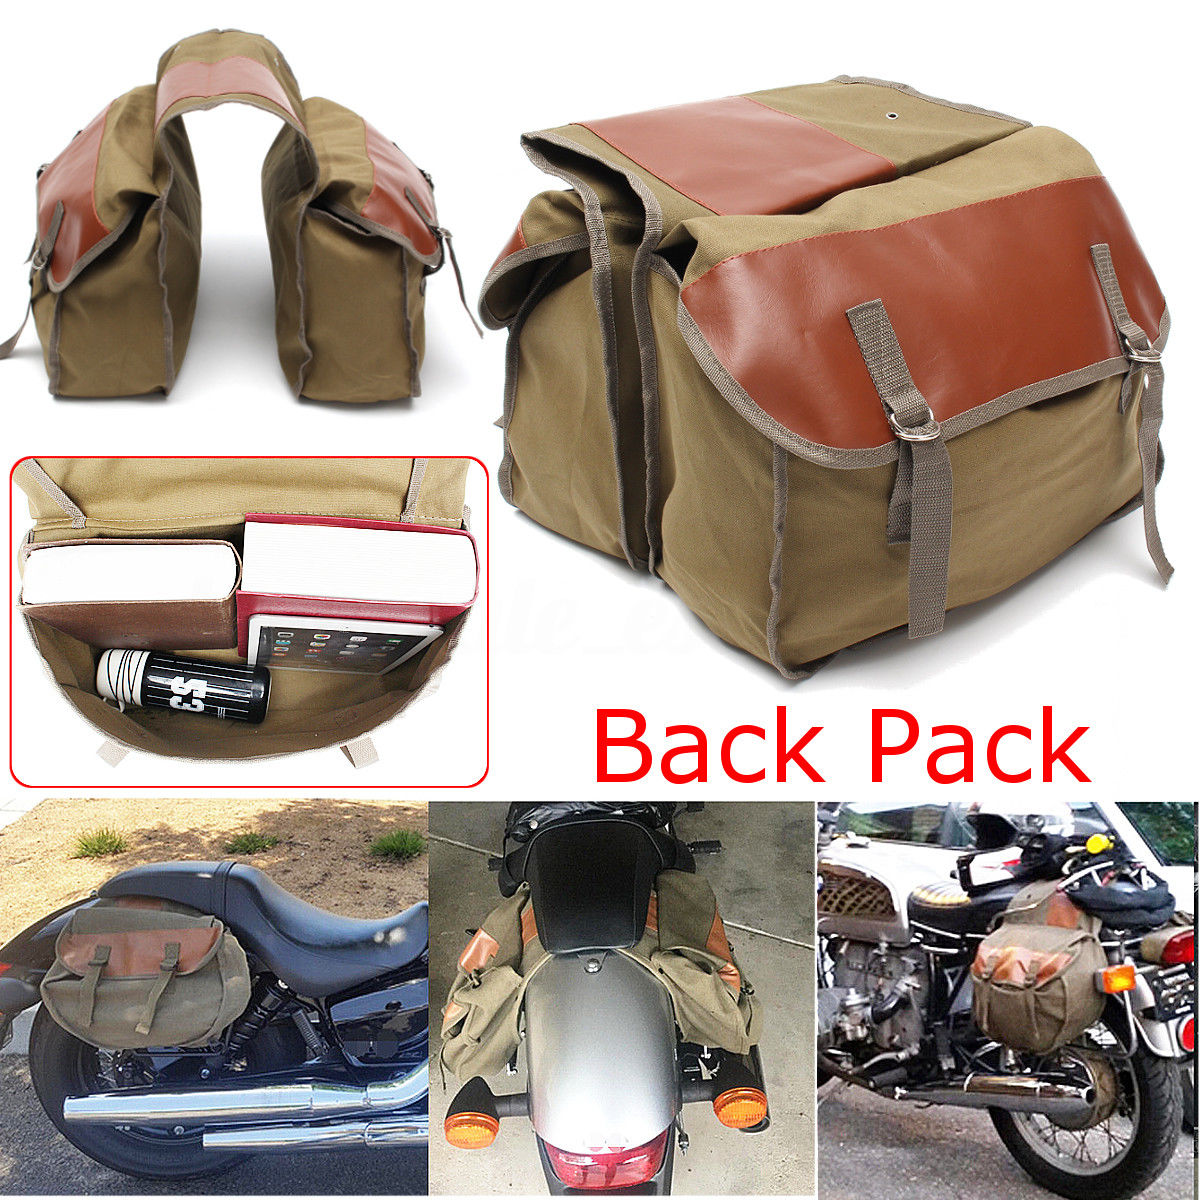 Alforja lateral de lona para motocicleta Equine Back Pack para ha-ley motocicleta Sportster mochila sillín con 2 bolsillos para Hon/da